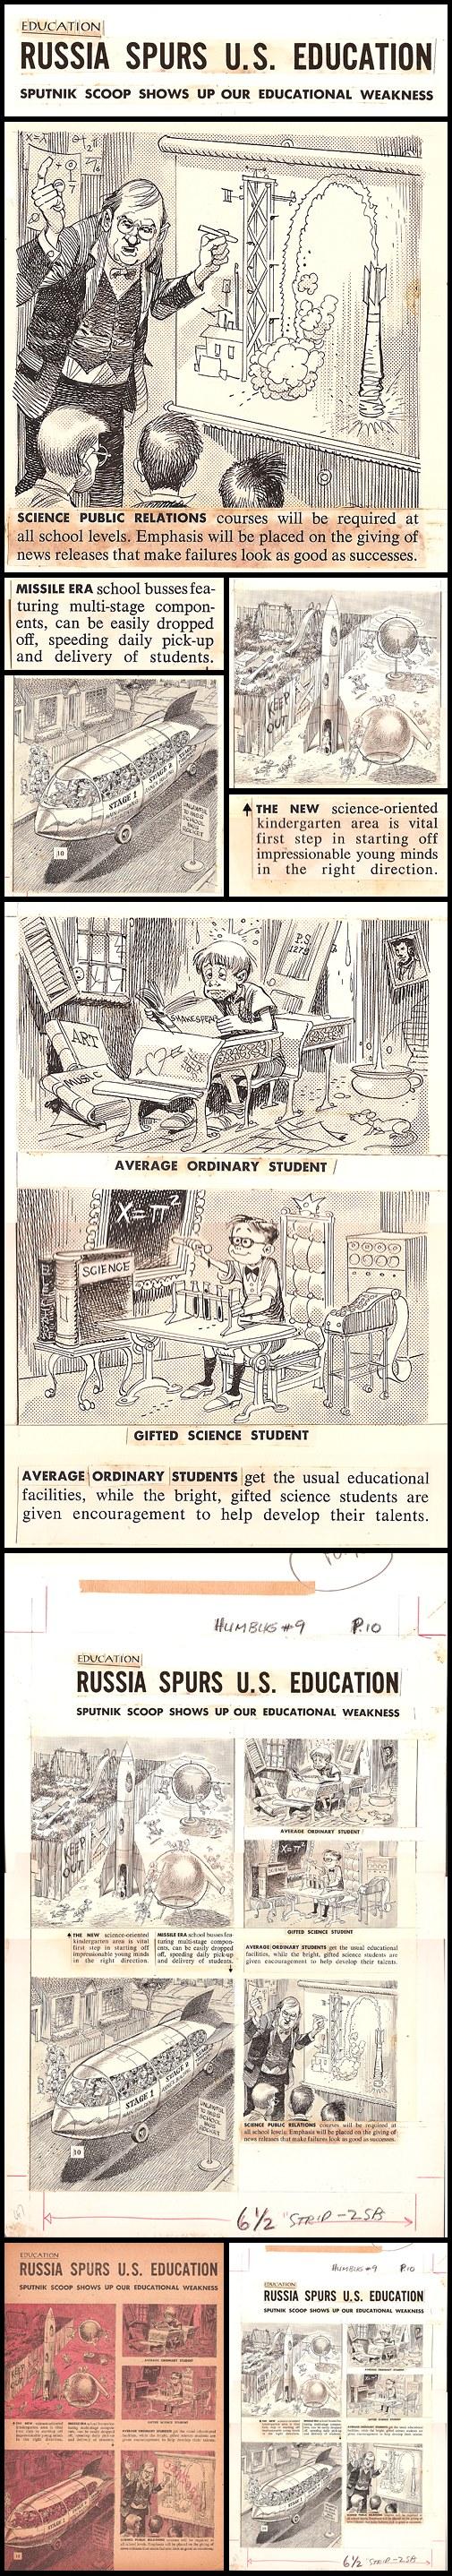 "39. Humbug #9: ""Russia Spurs U.S. Education"" by Jack Davis (May 1958)"